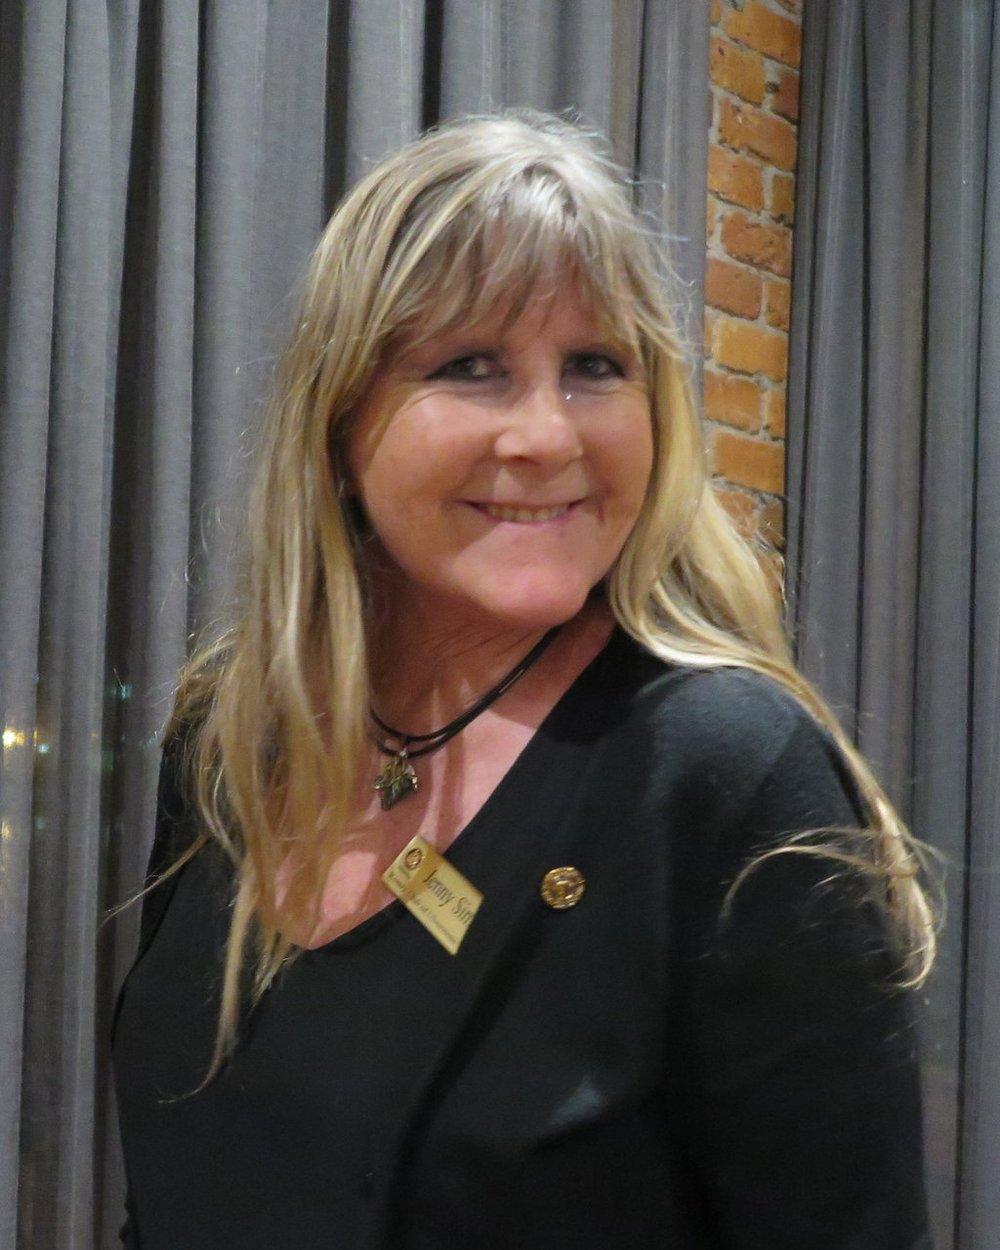 Jenny Simms